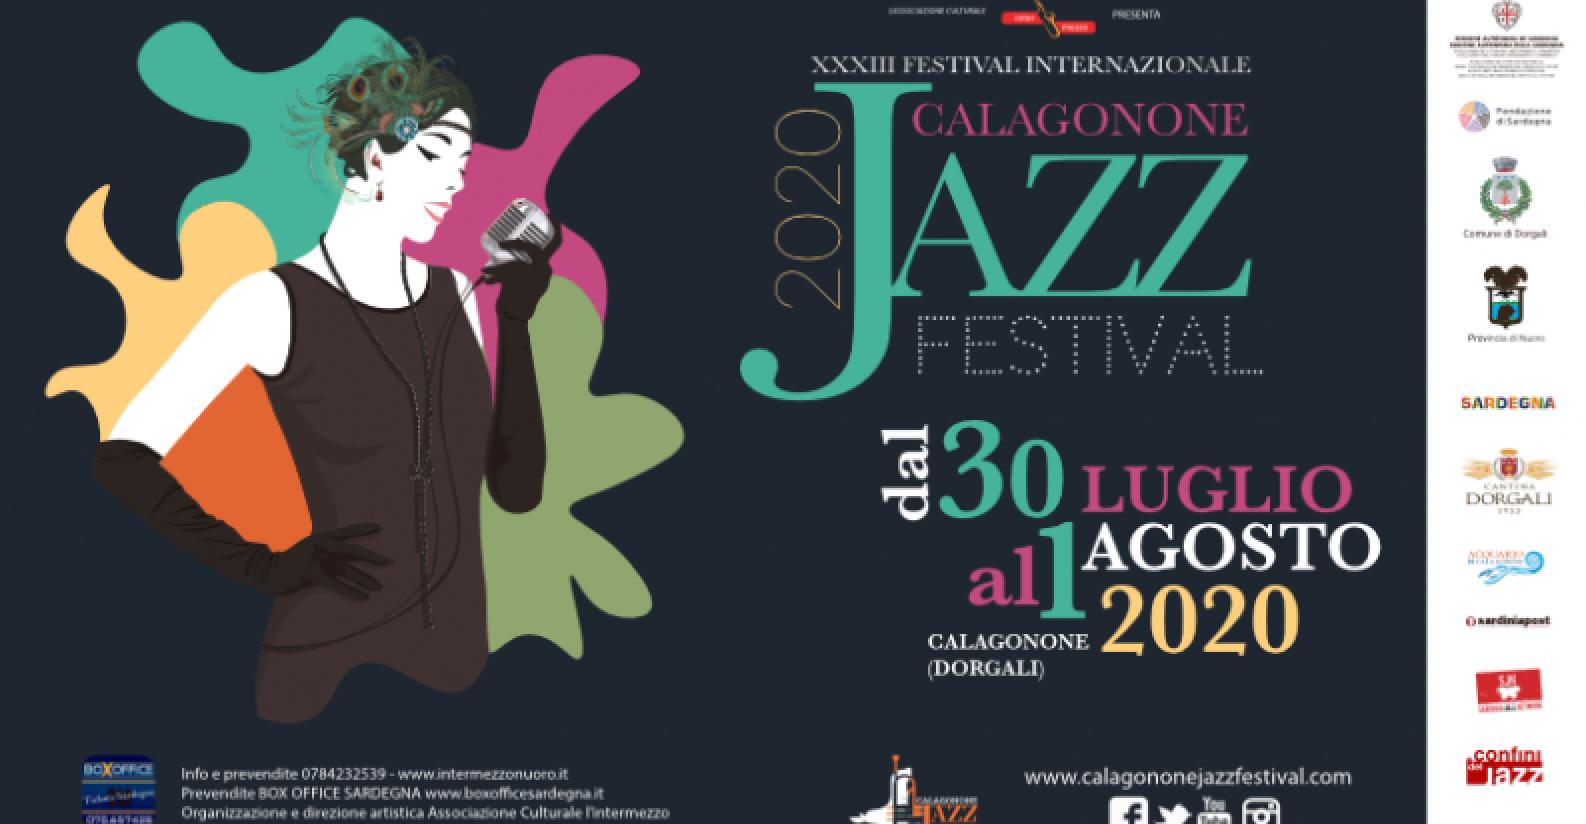 cala_gonone_jazz_2020